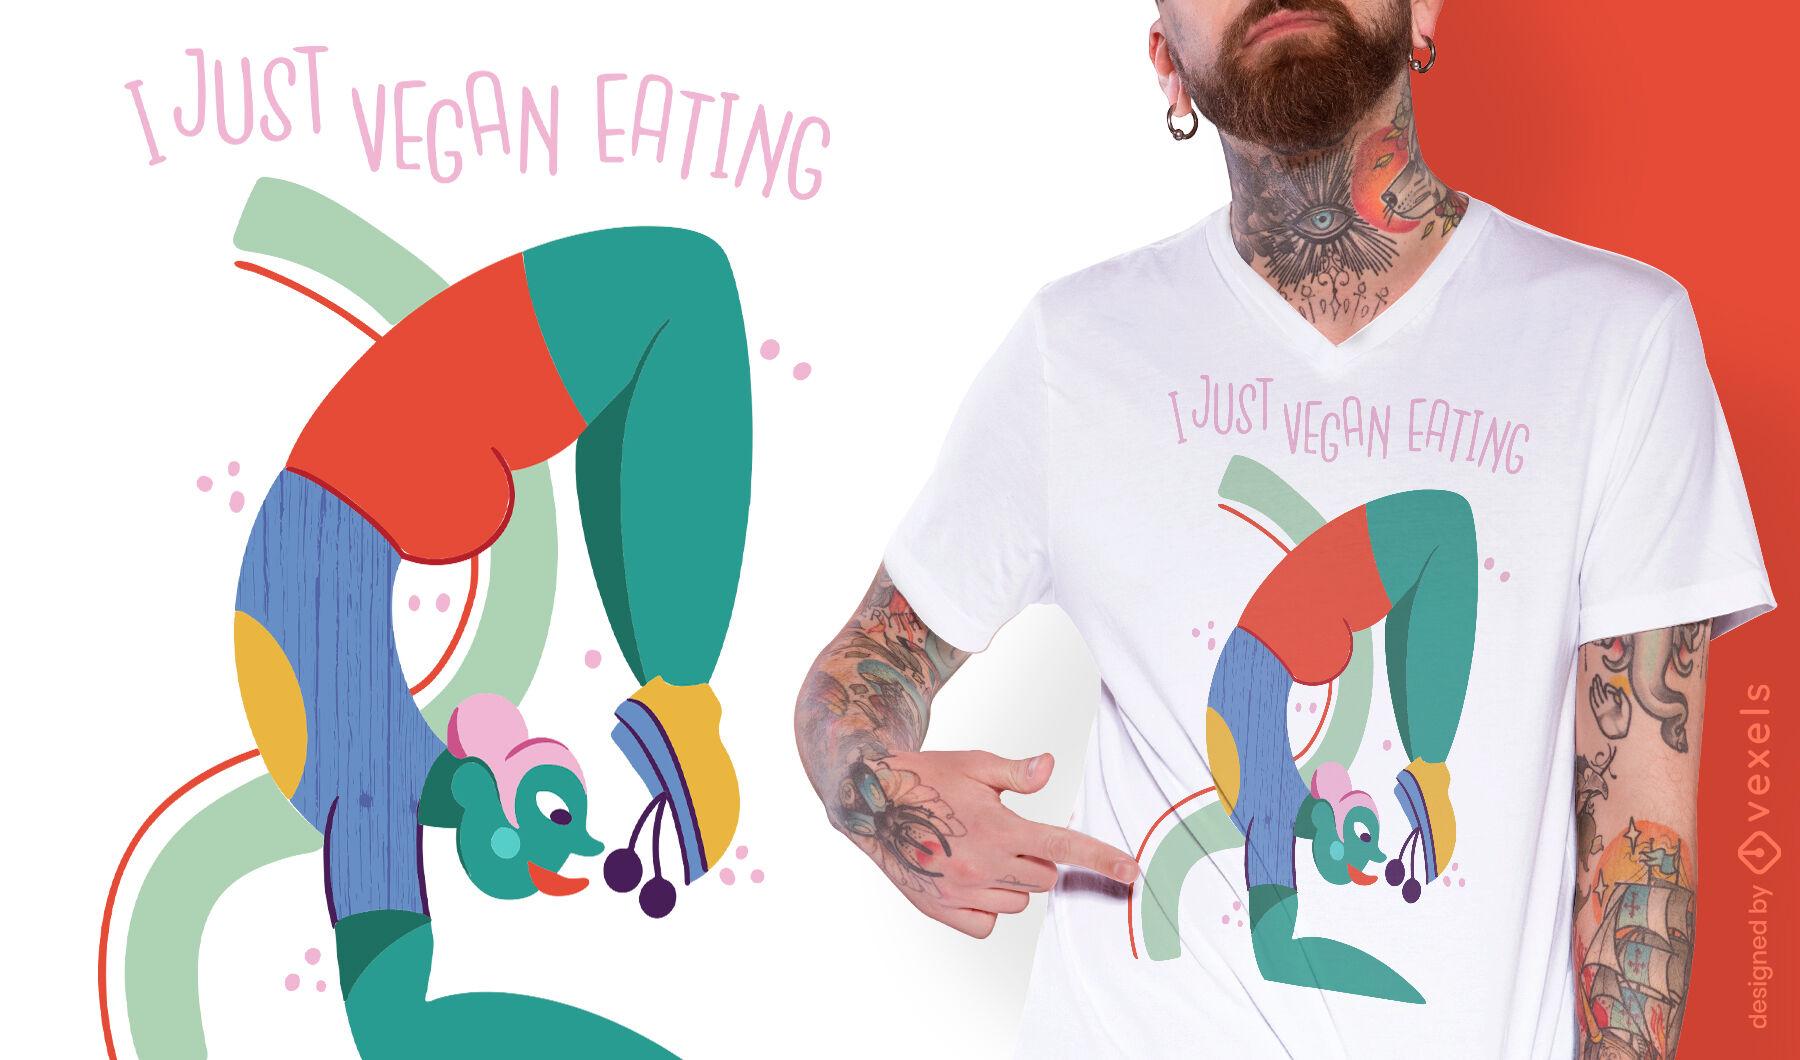 Vegan eating quote t-shirt design